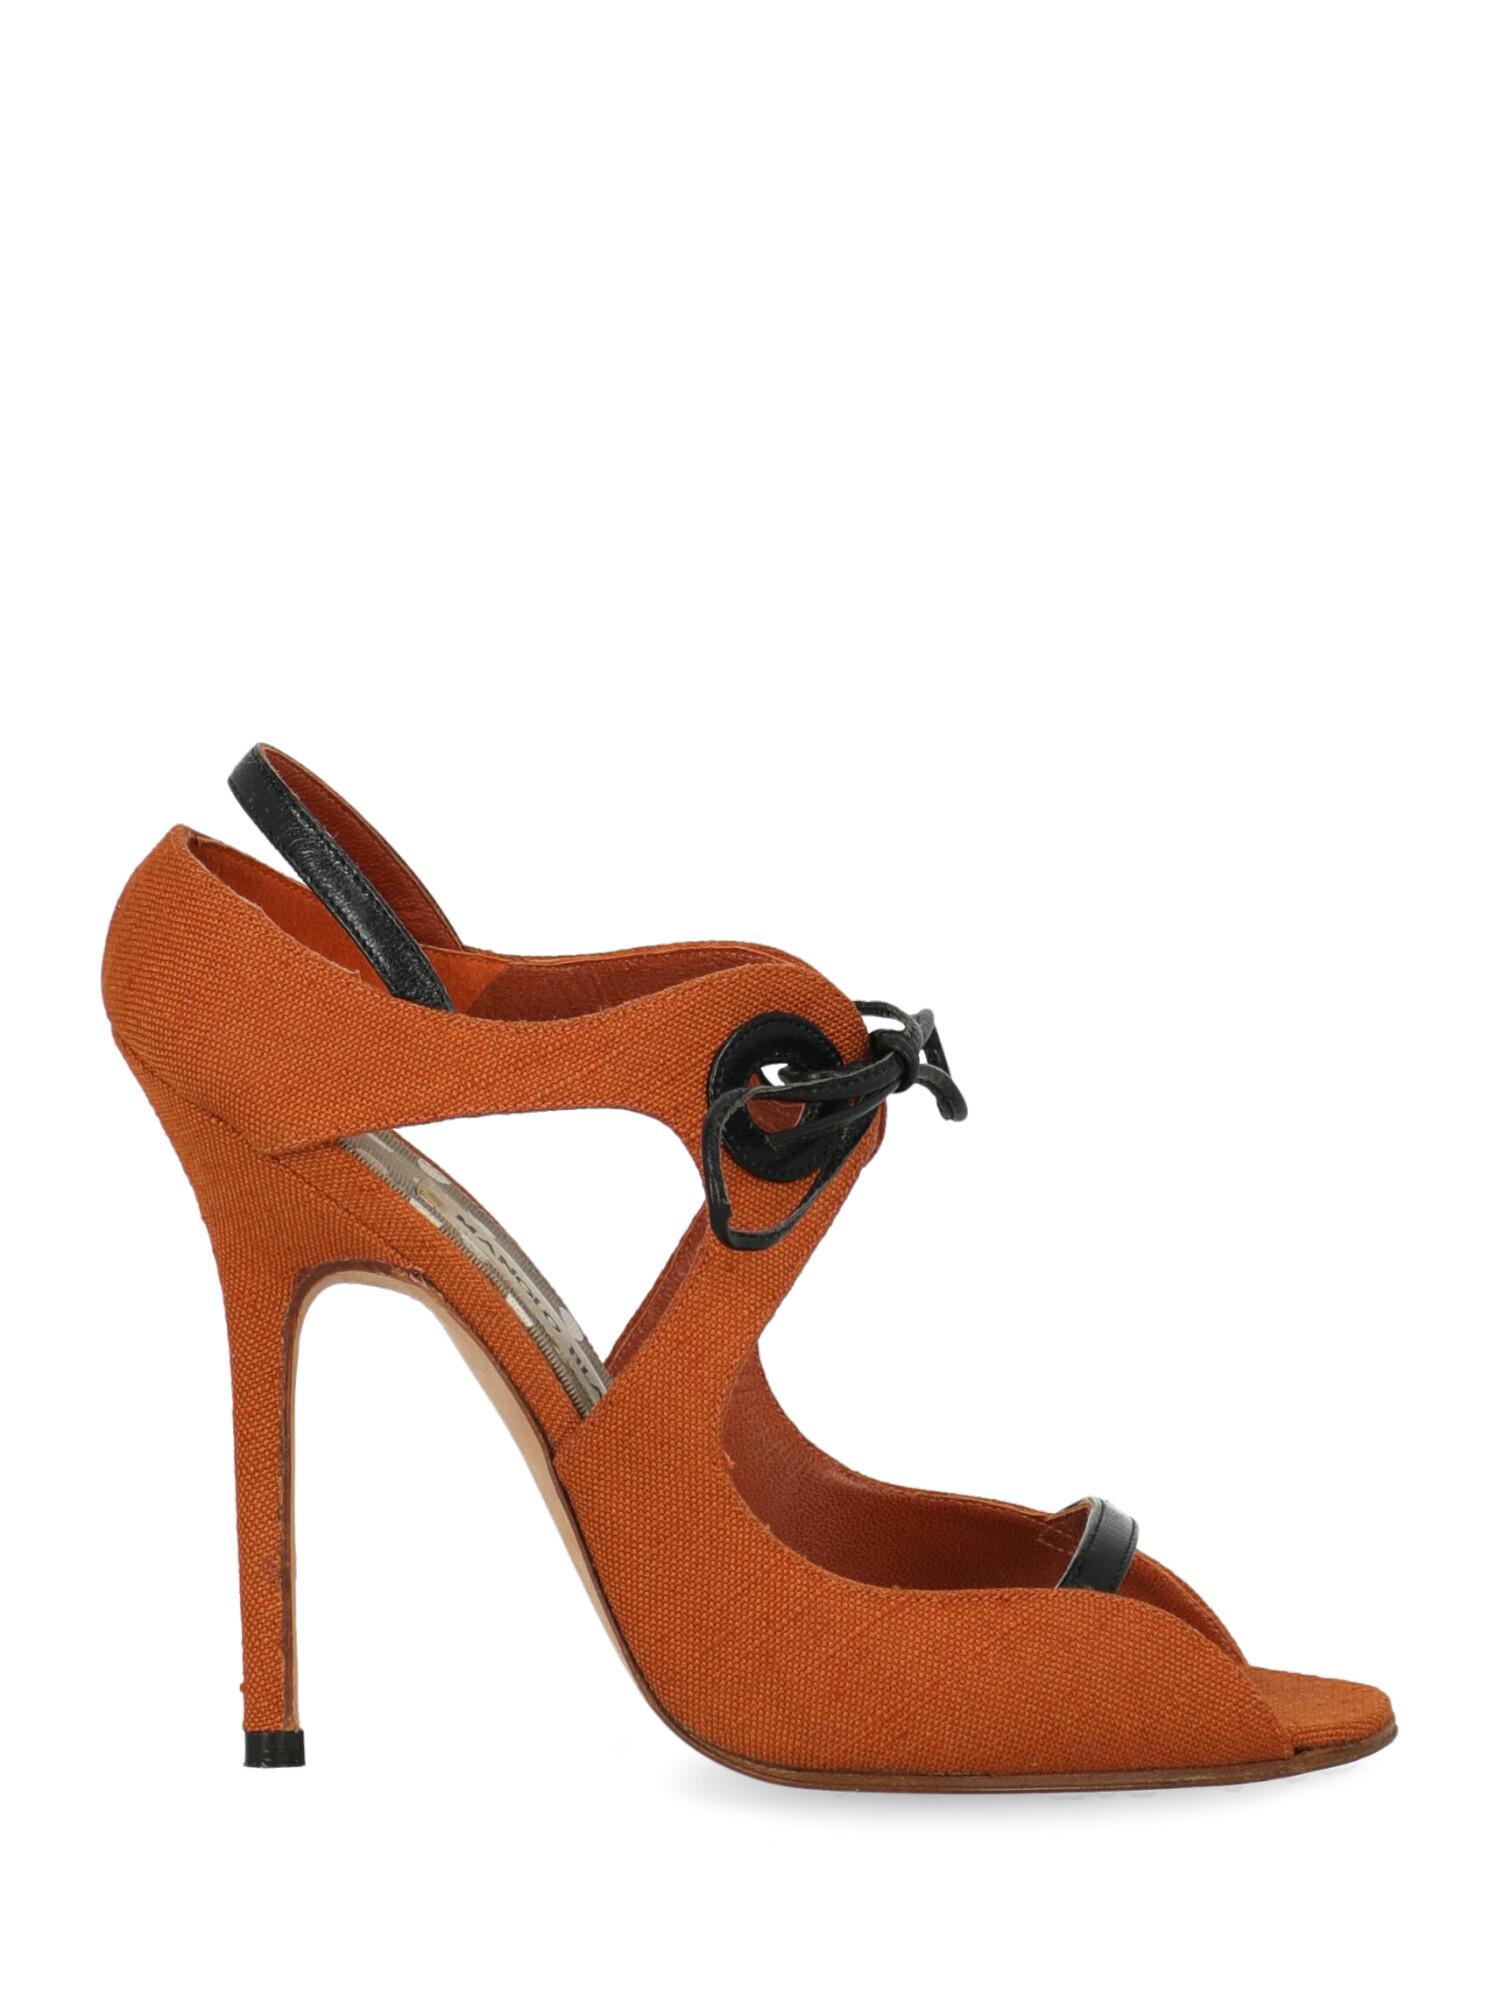 Pre-owned Manolo Blahnik Shoe In Black, Orange